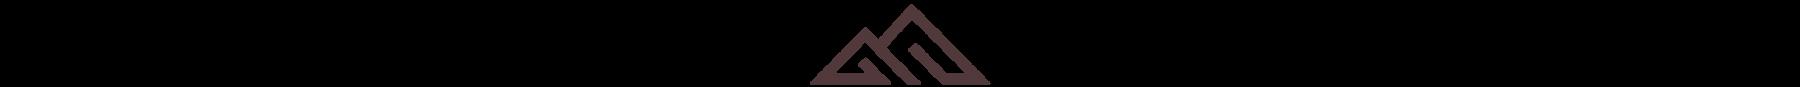 Decorative logo